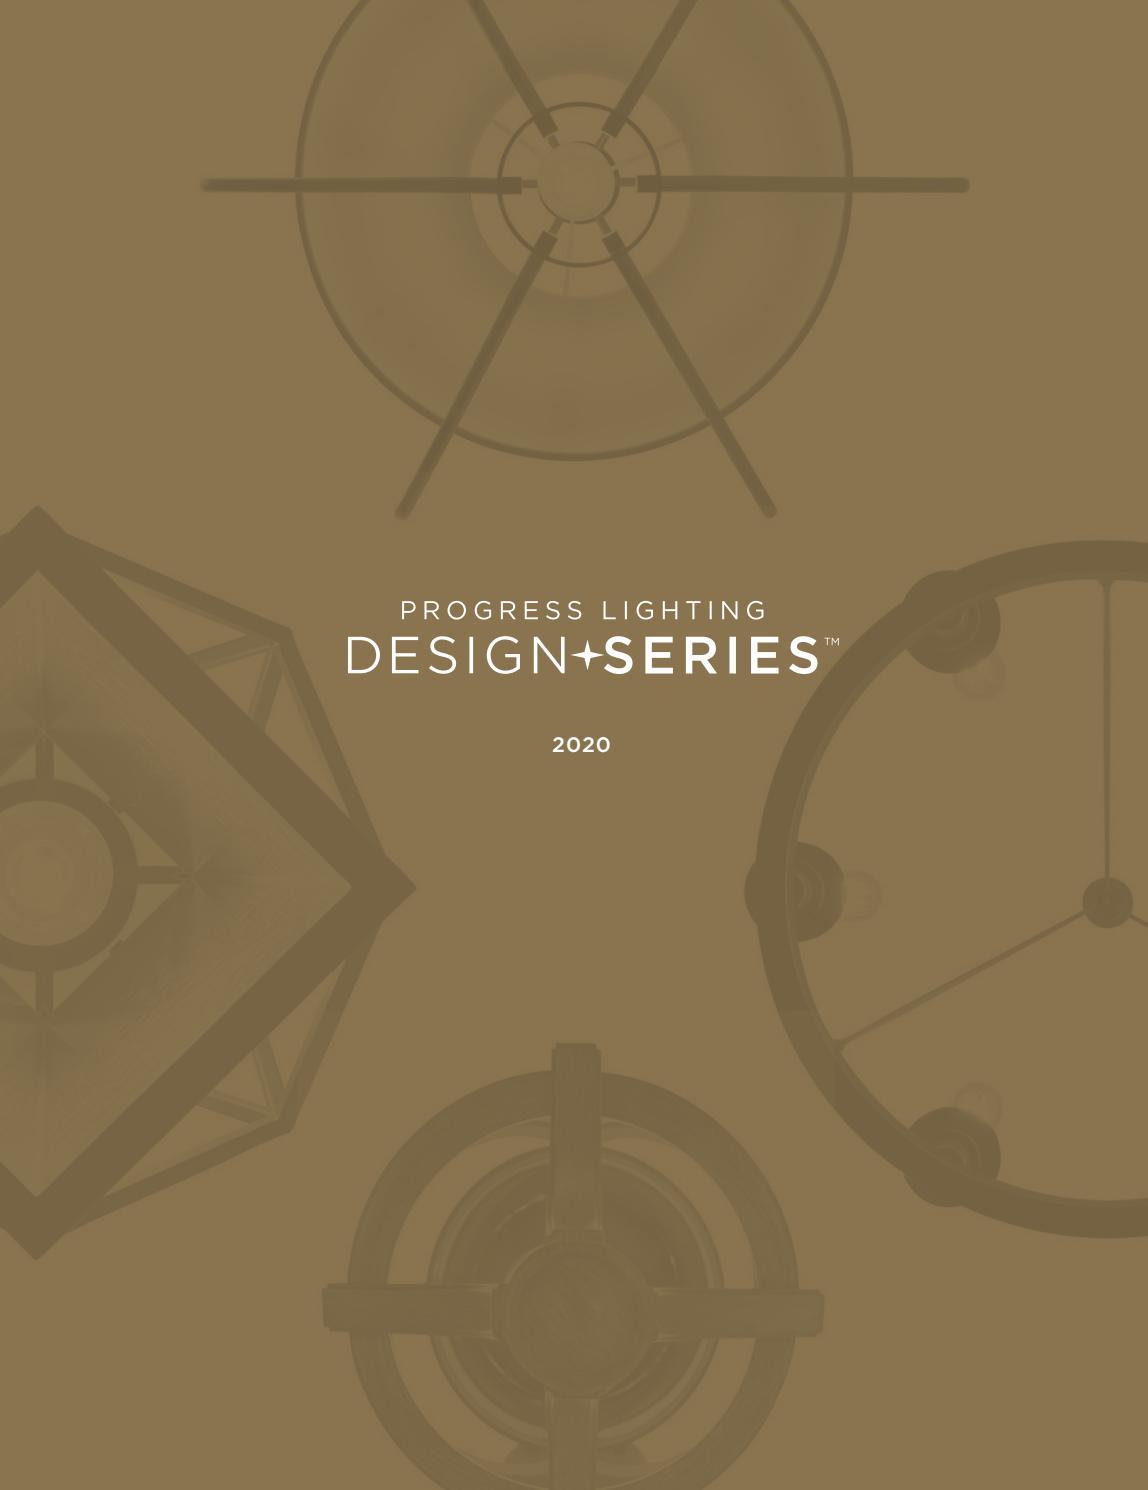 progress lighting 2020 design series